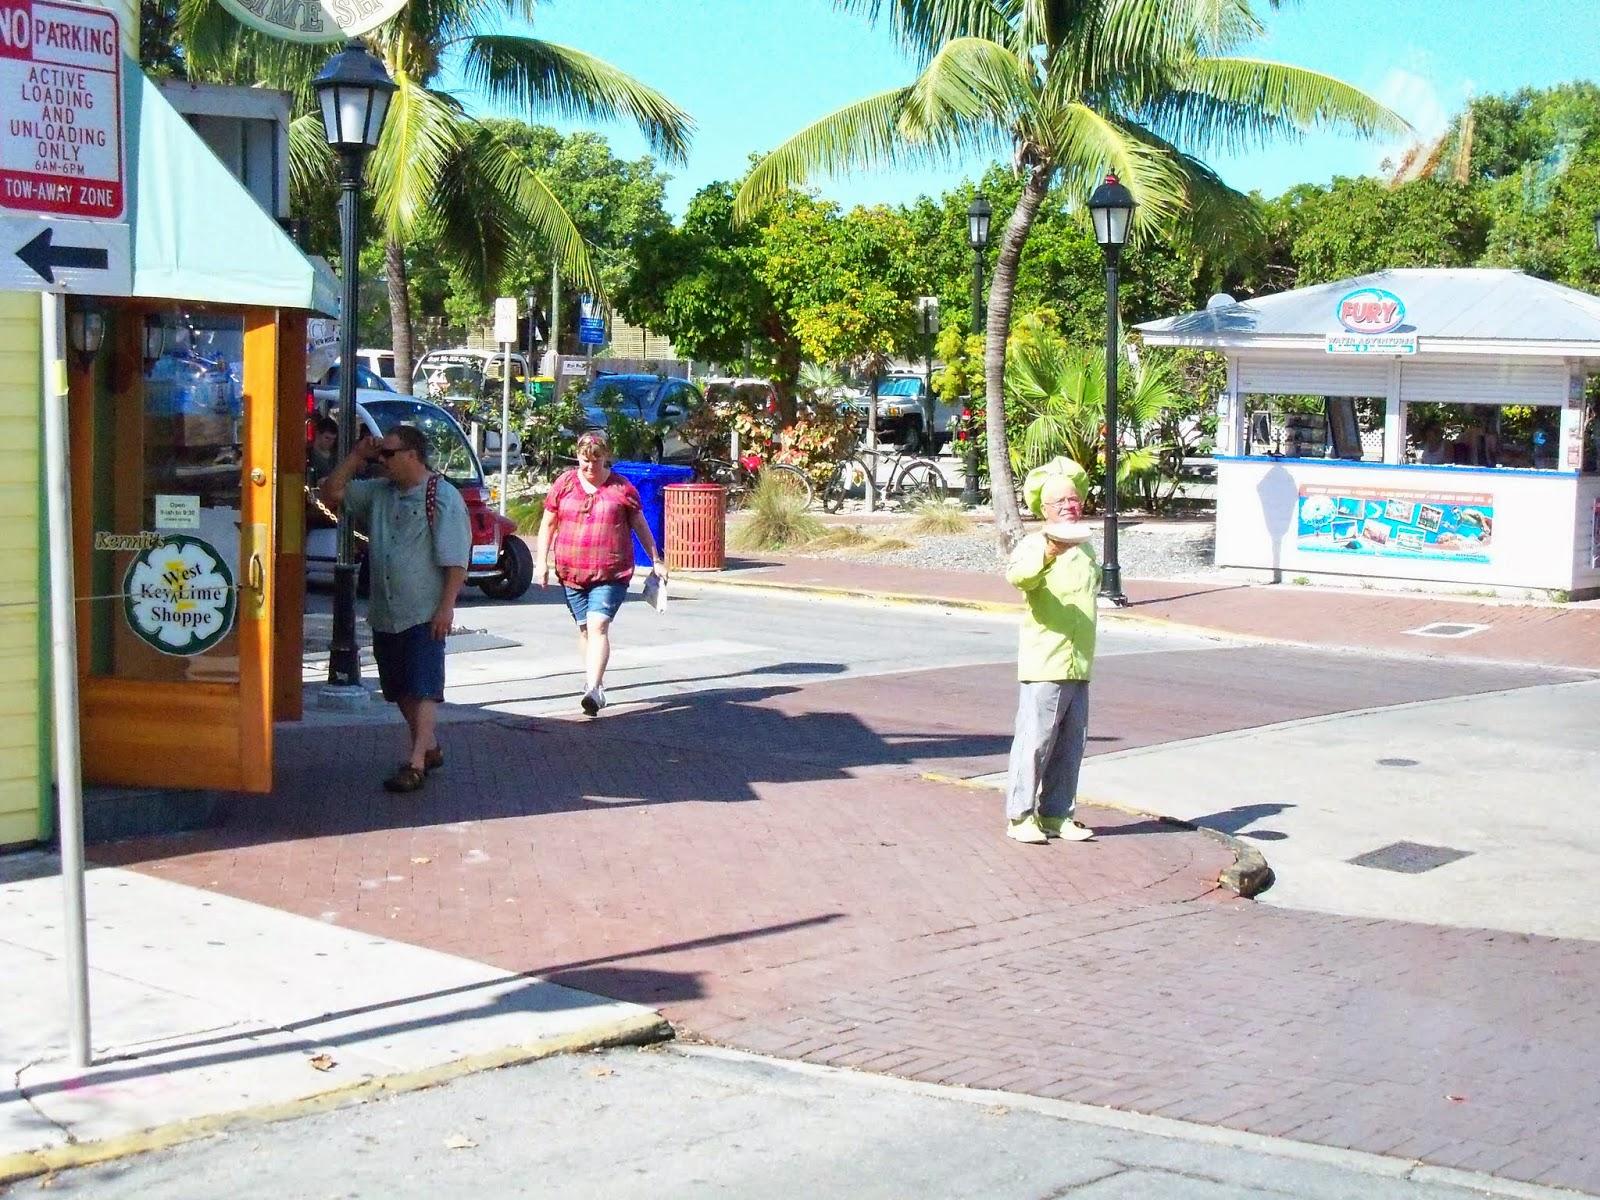 Key West Vacation - 116_5705.JPG